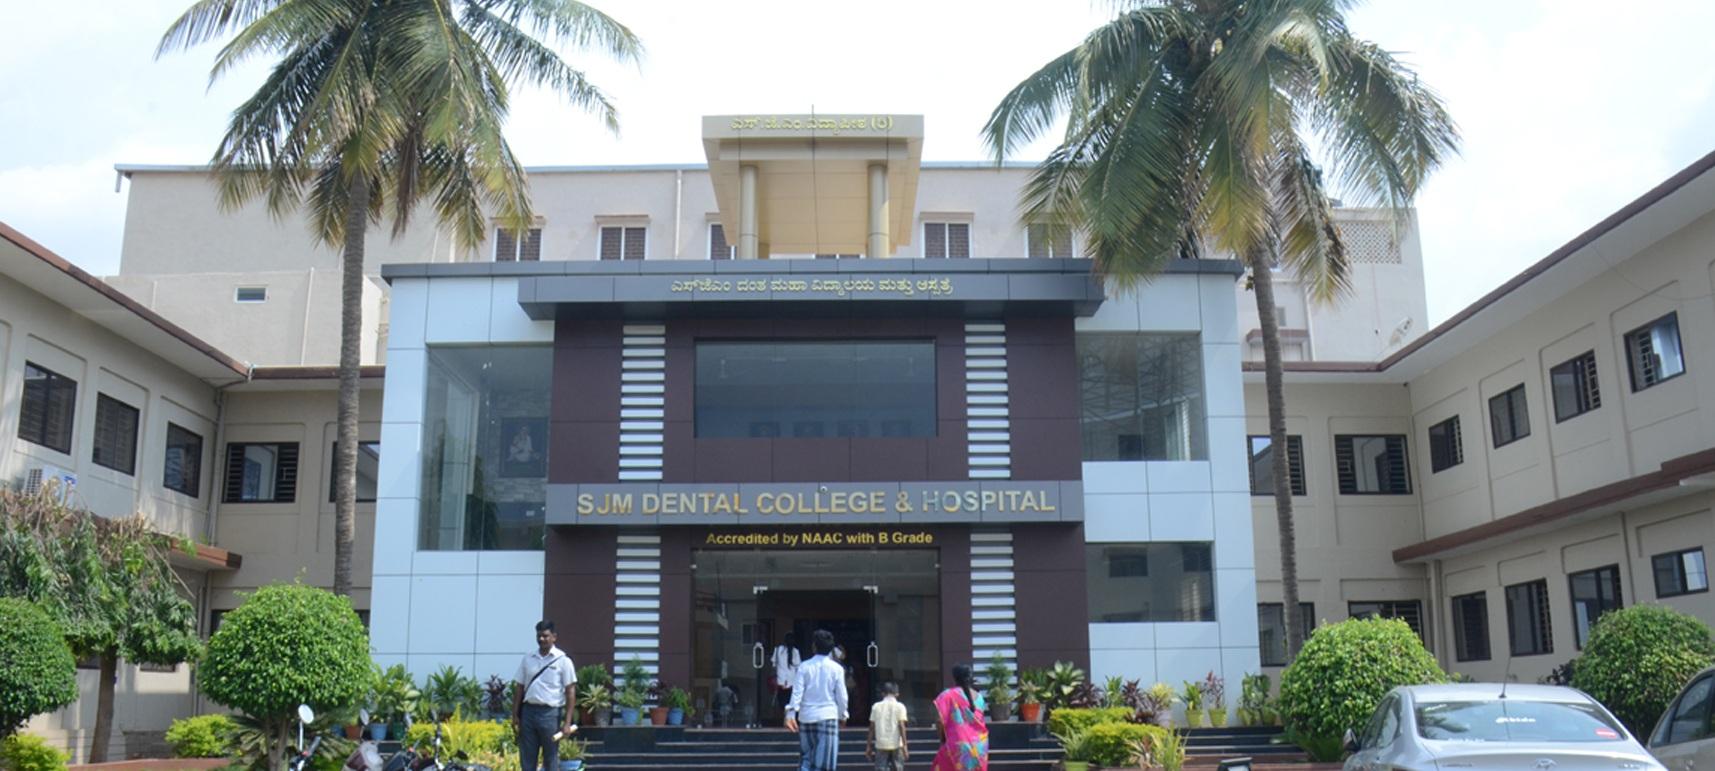 S.J.M. Dental College and  Hospital Image